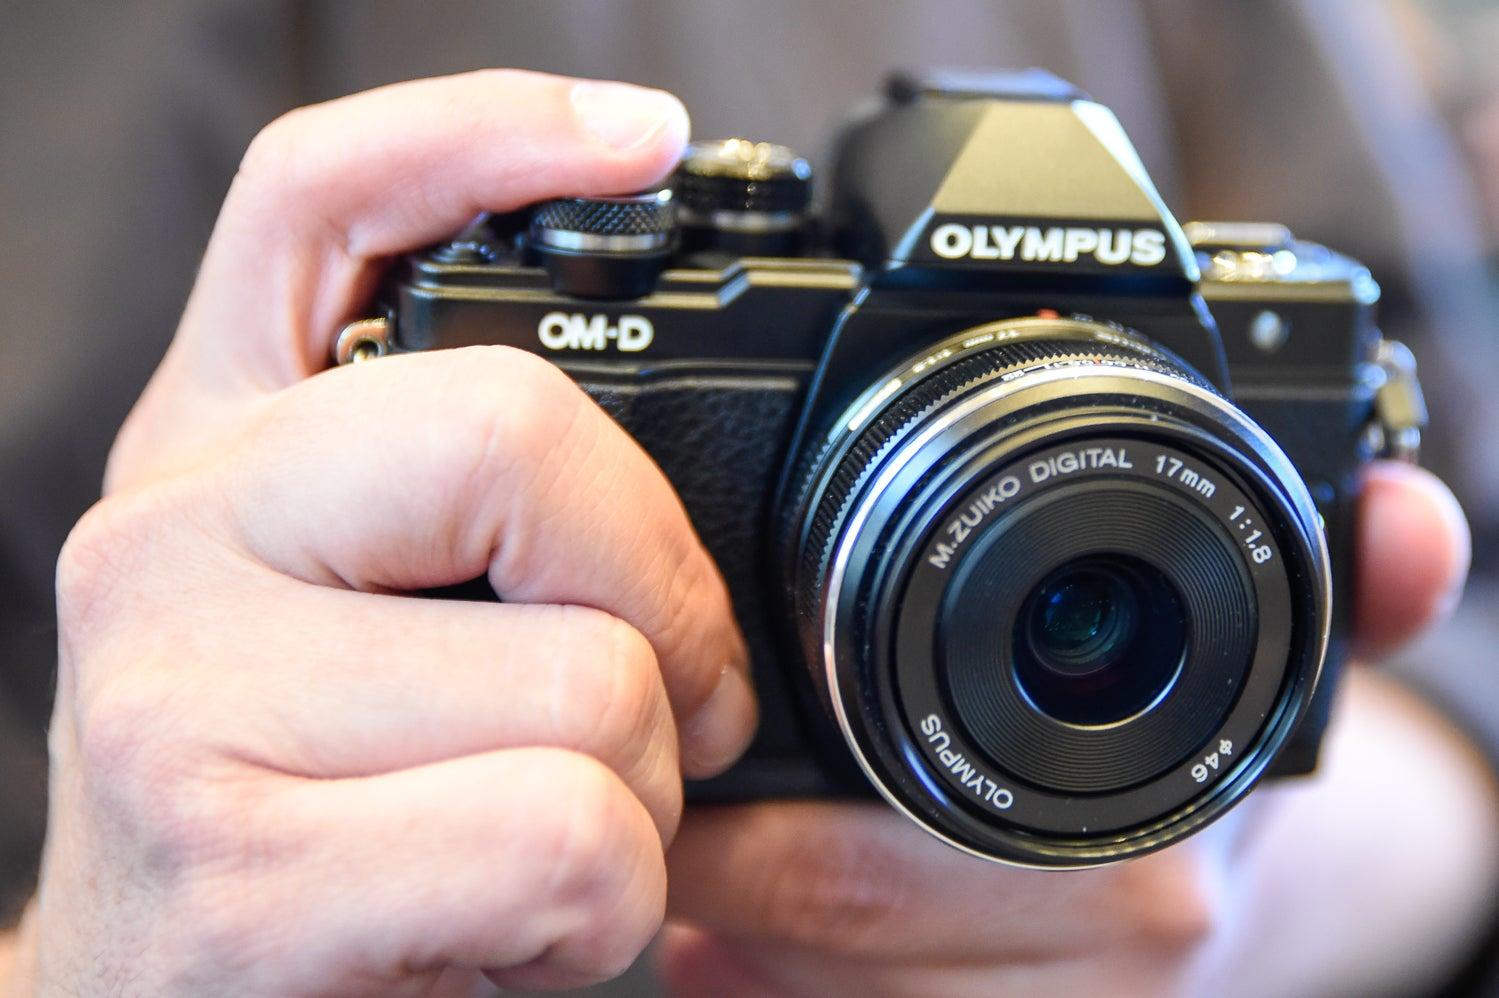 New Gear: Olympus OM-D E M10 Mark II Camera